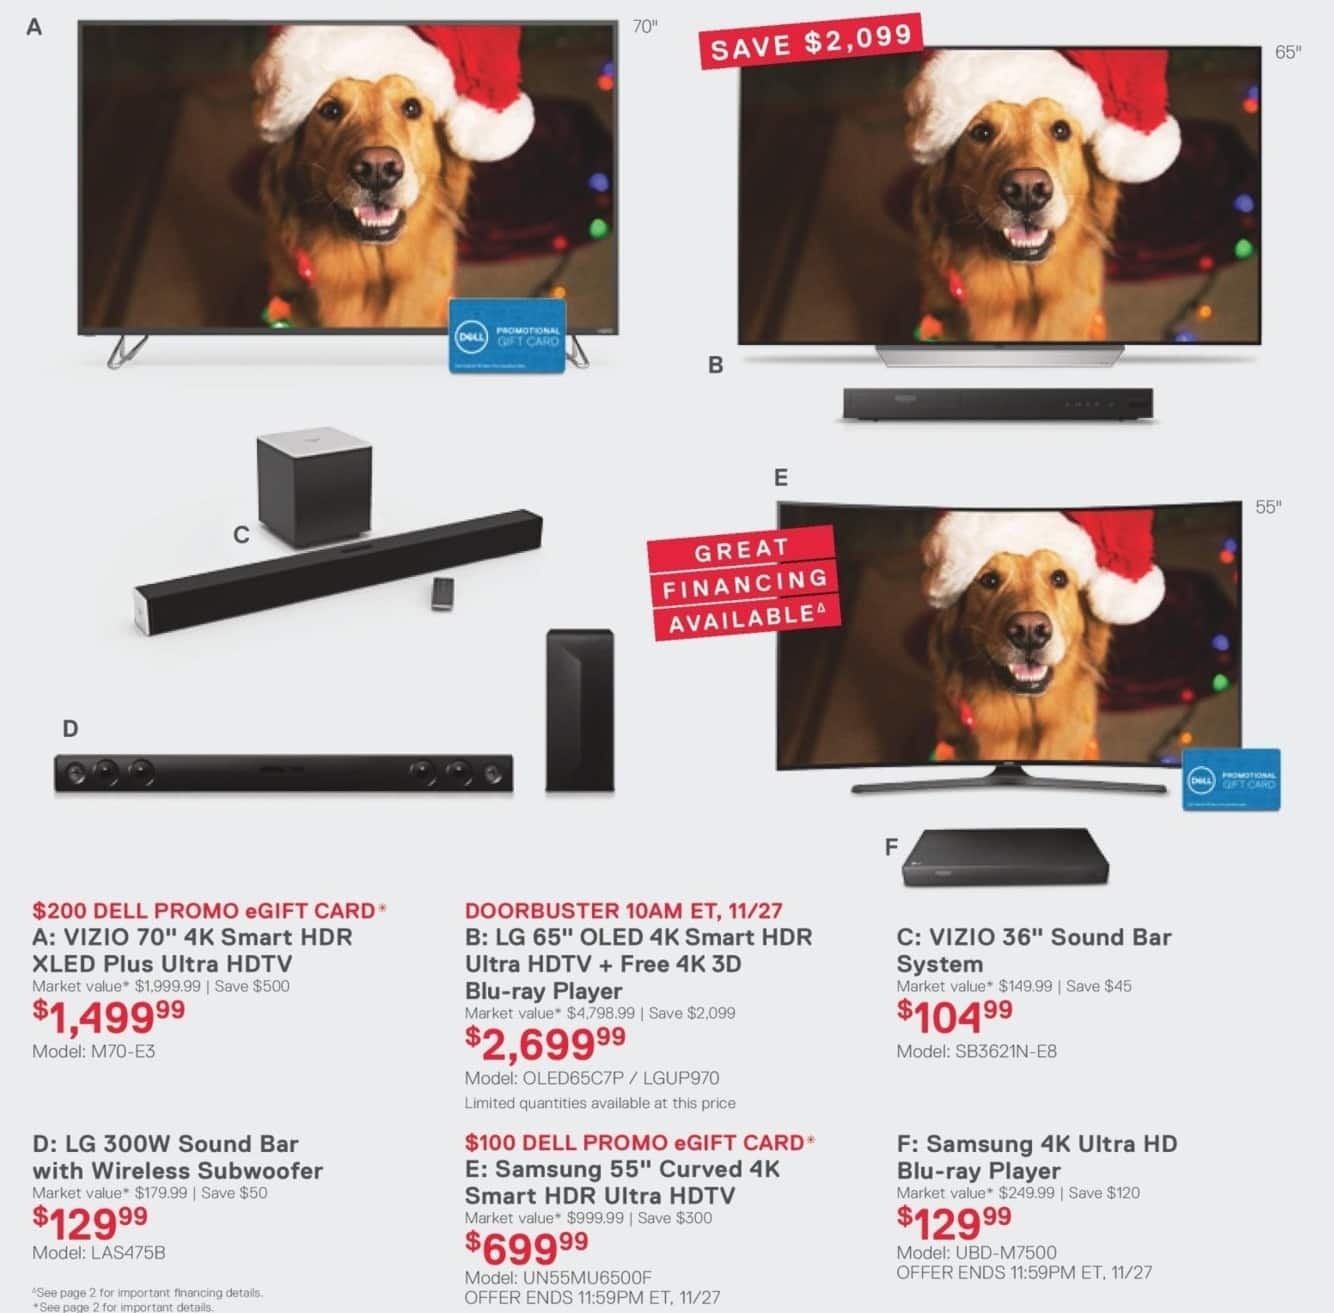 "Dell Home & Office Cyber Monday: Vizio 36"" Sound Bar System for $104.99"